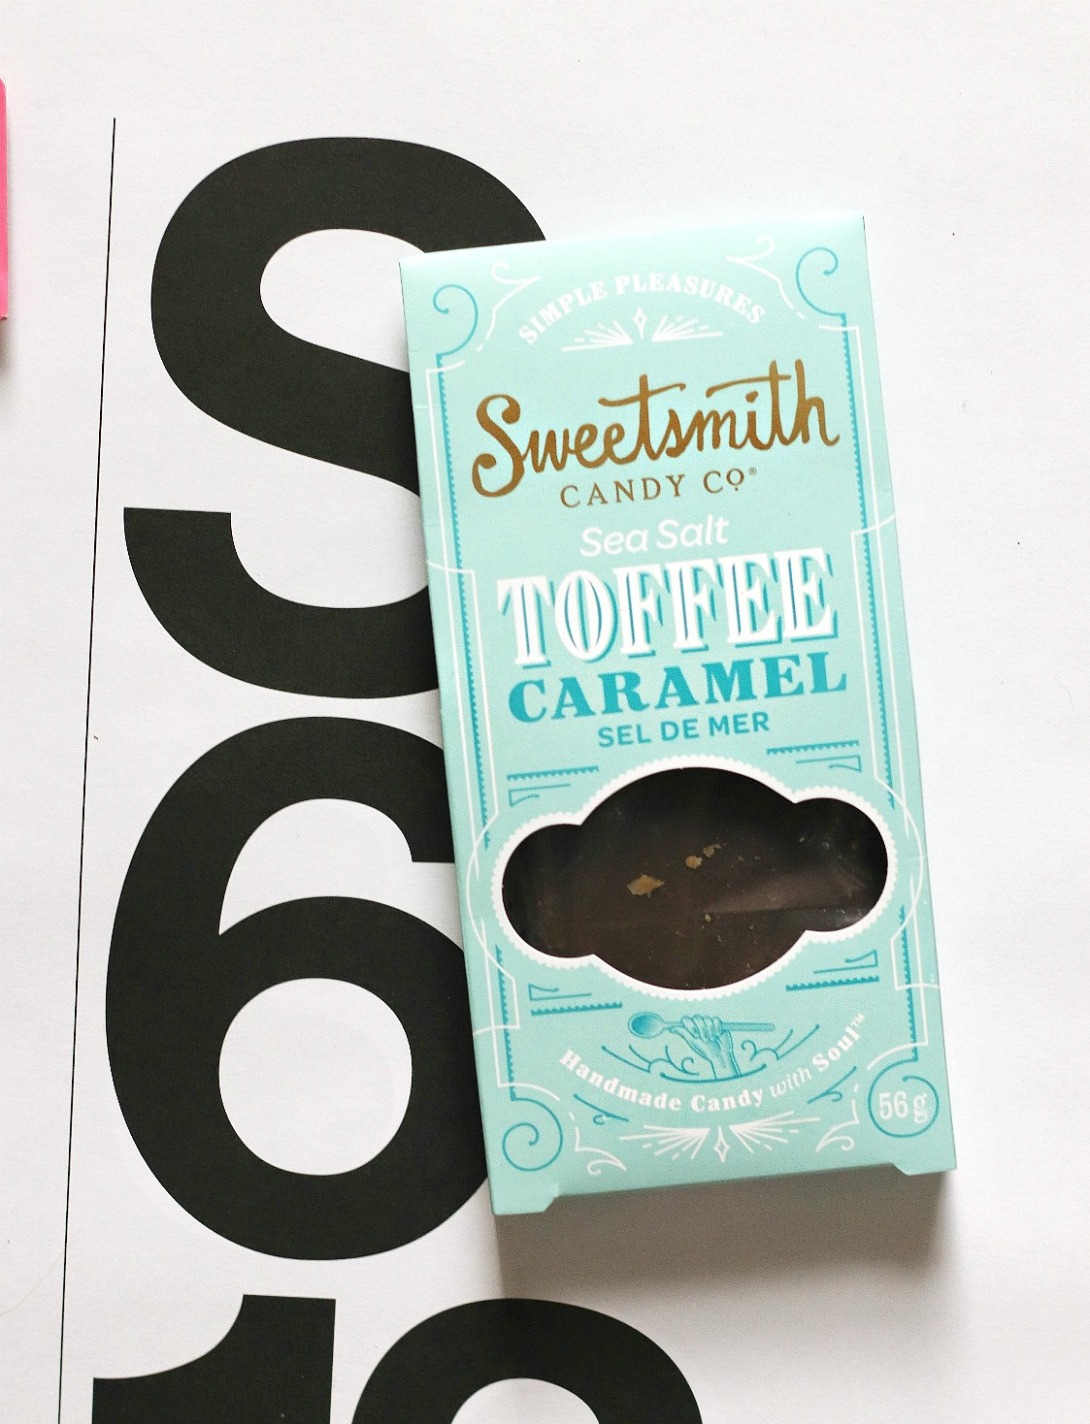 Sweet Reads Box May 2018 Sweetsmith Sea Salt Toffee Caramel 2